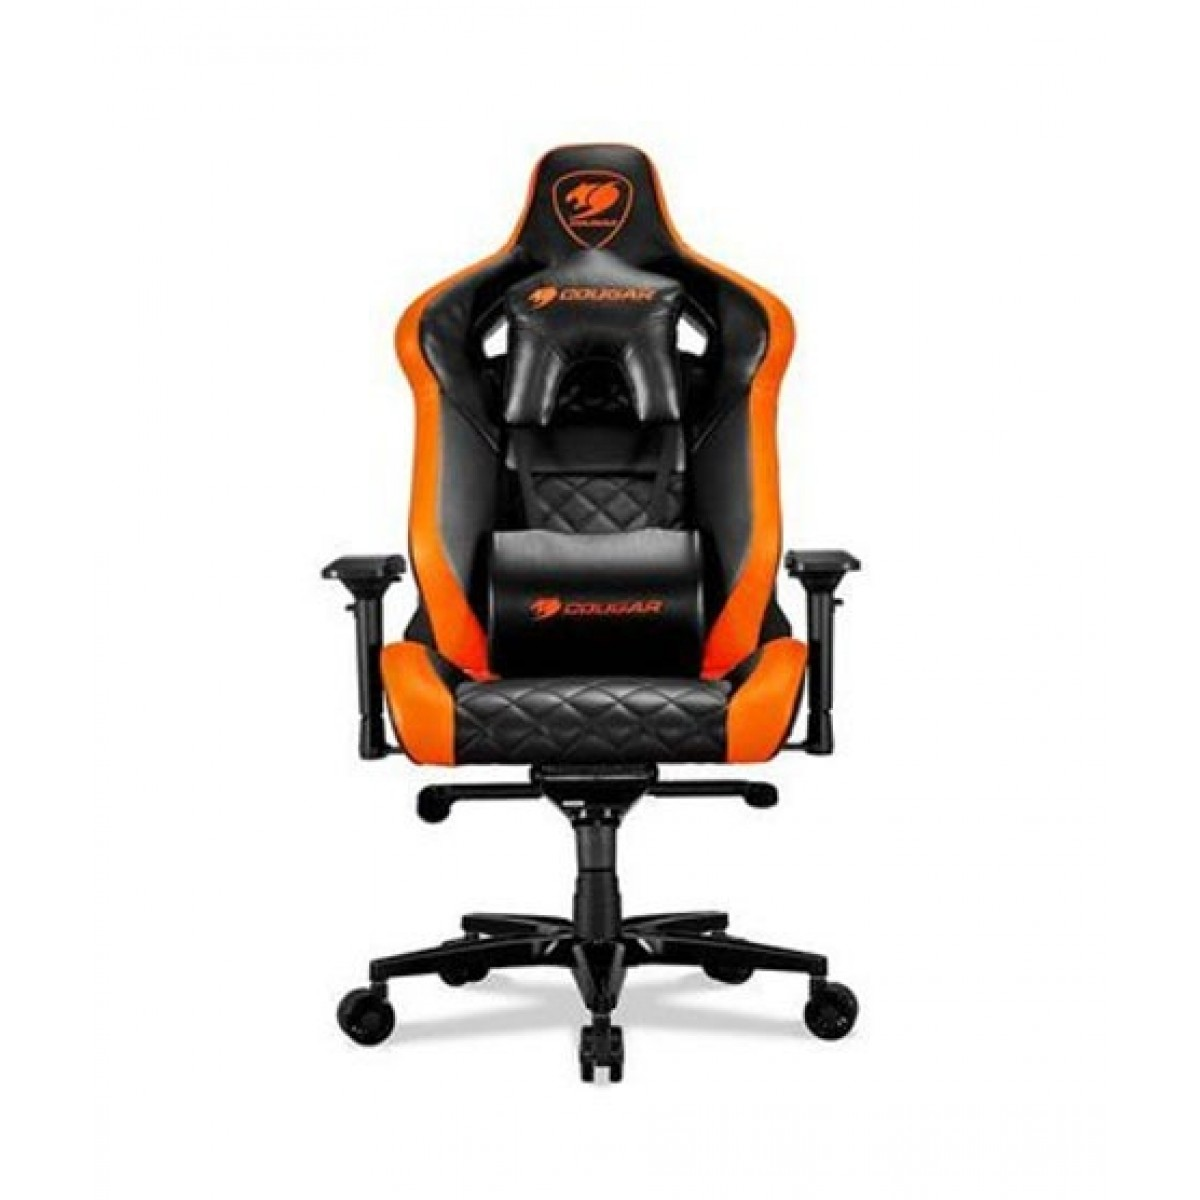 Cougar Armor Titan Gaming Chair Orange/Black